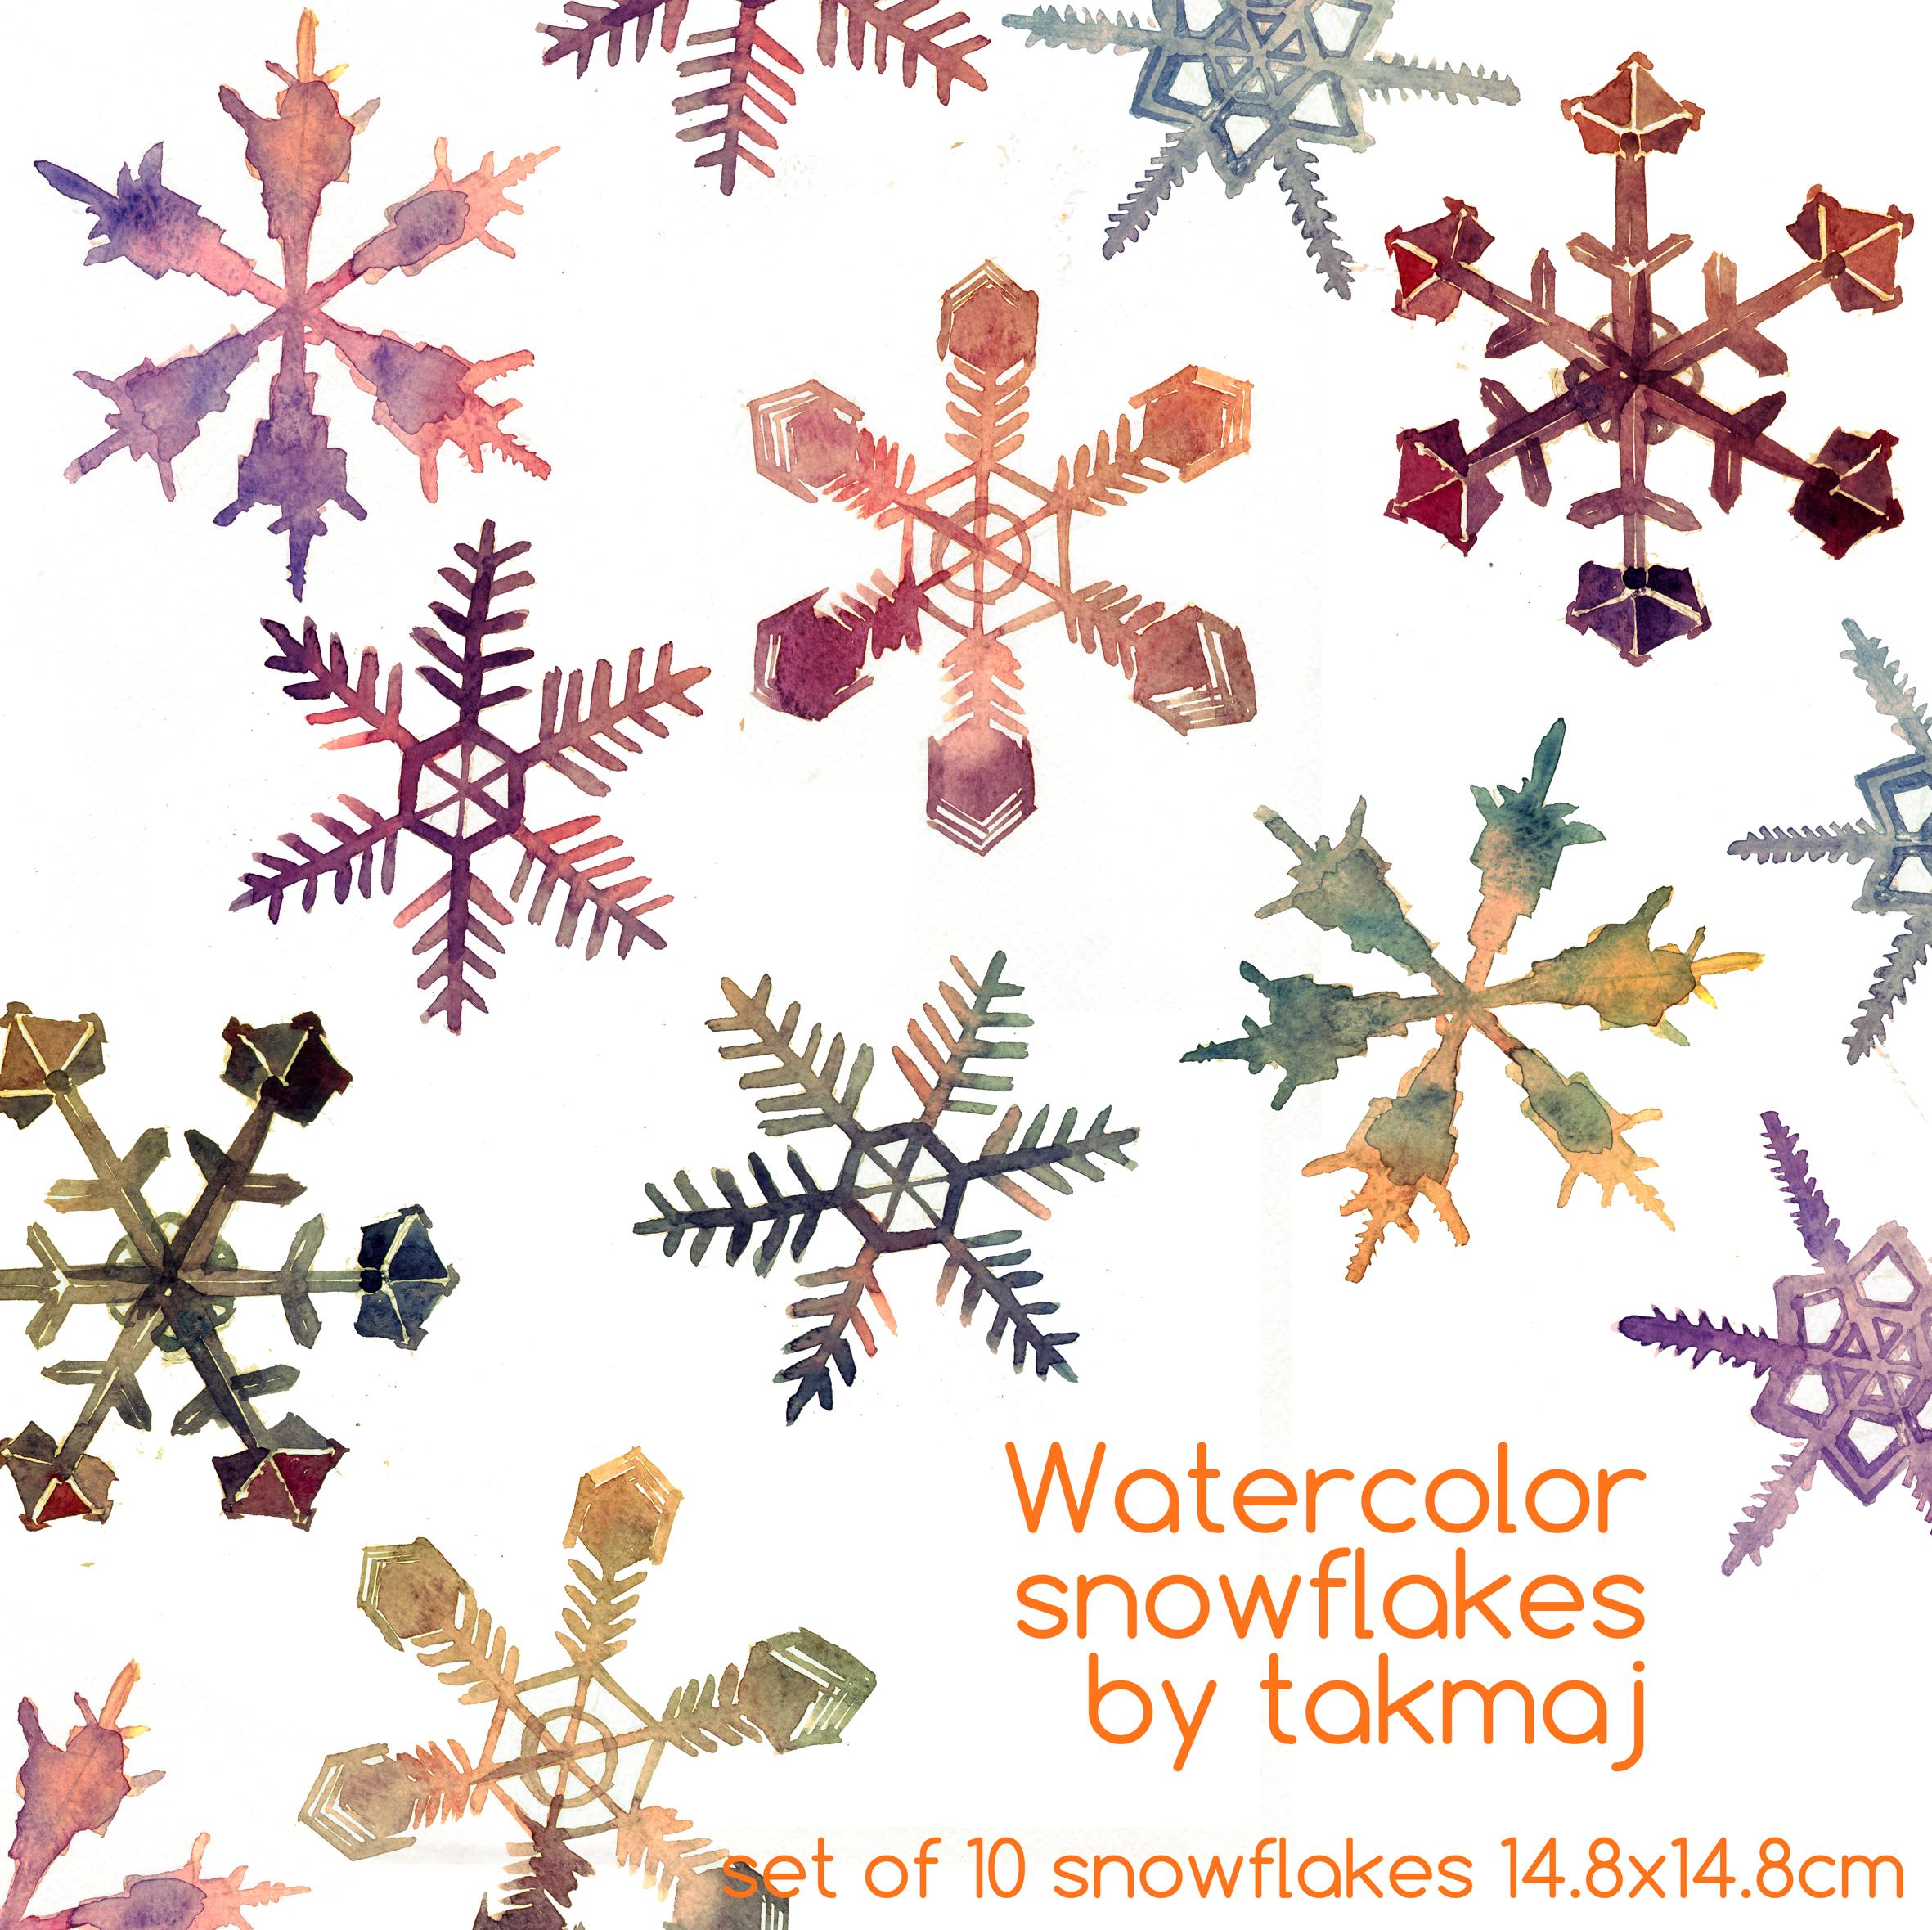 watercolor snowflakes by takmaj